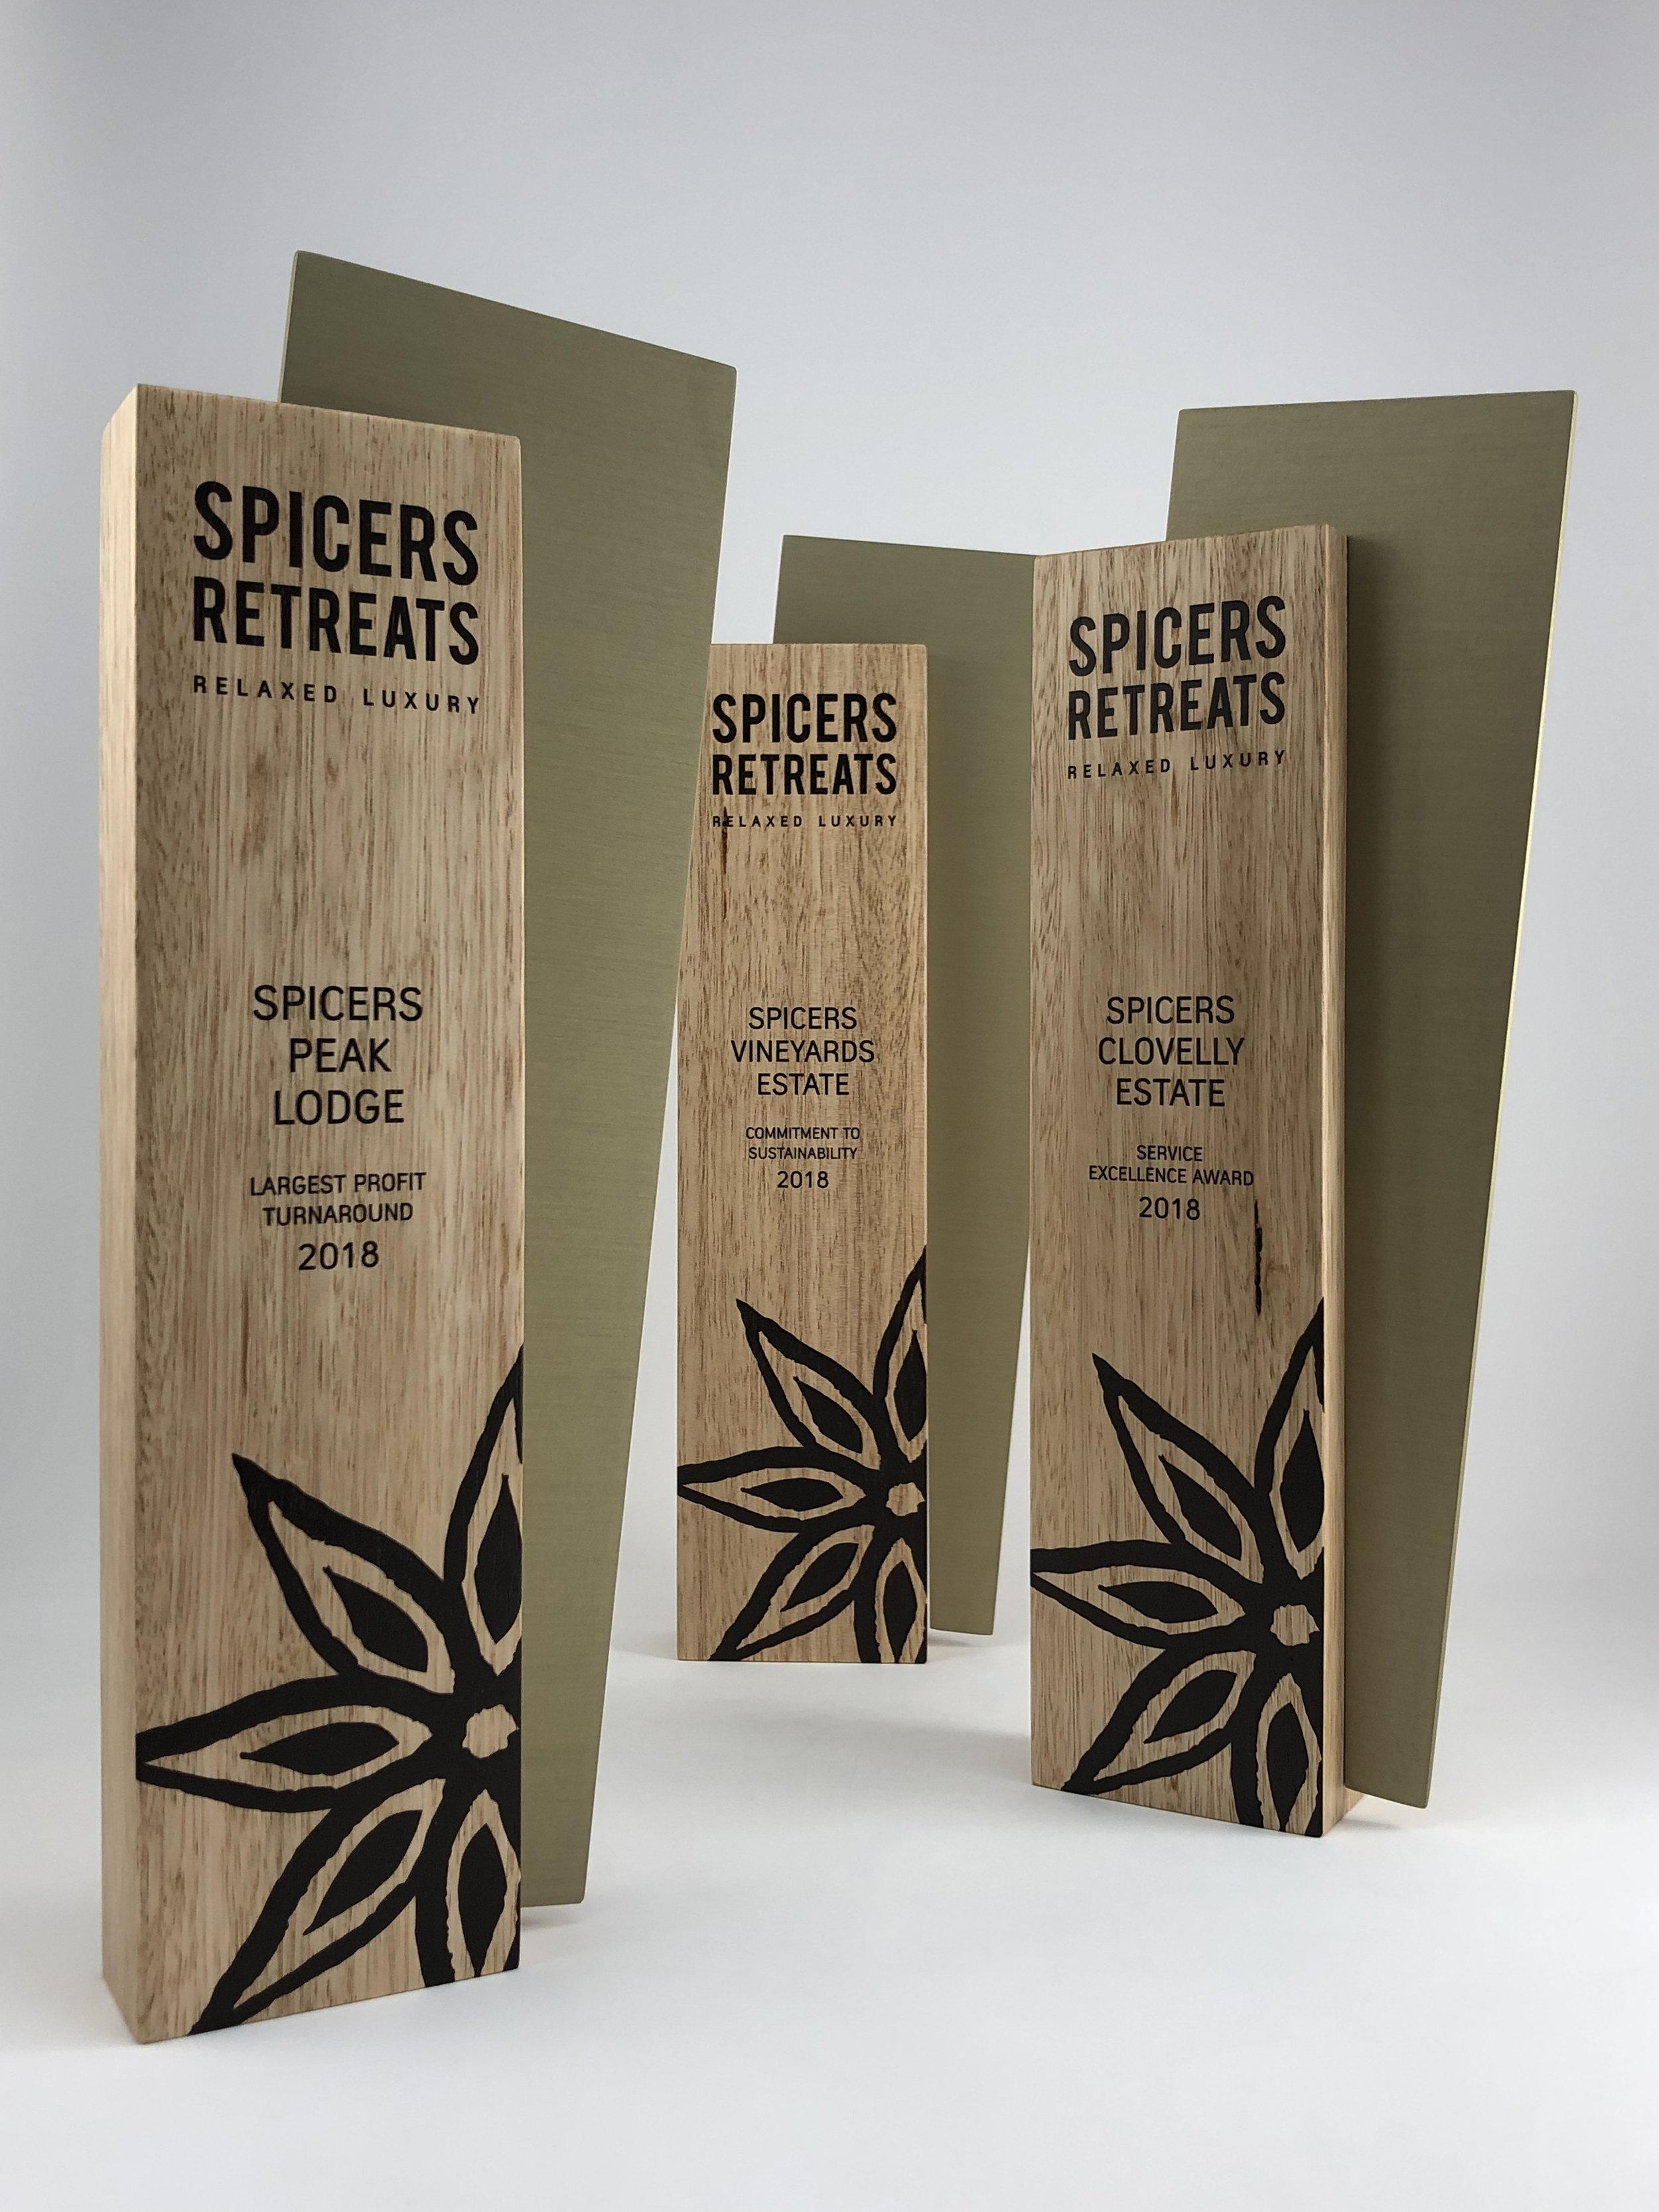 spicers-retreat-awards-timber-metal-art-print-trophy-02.jpg